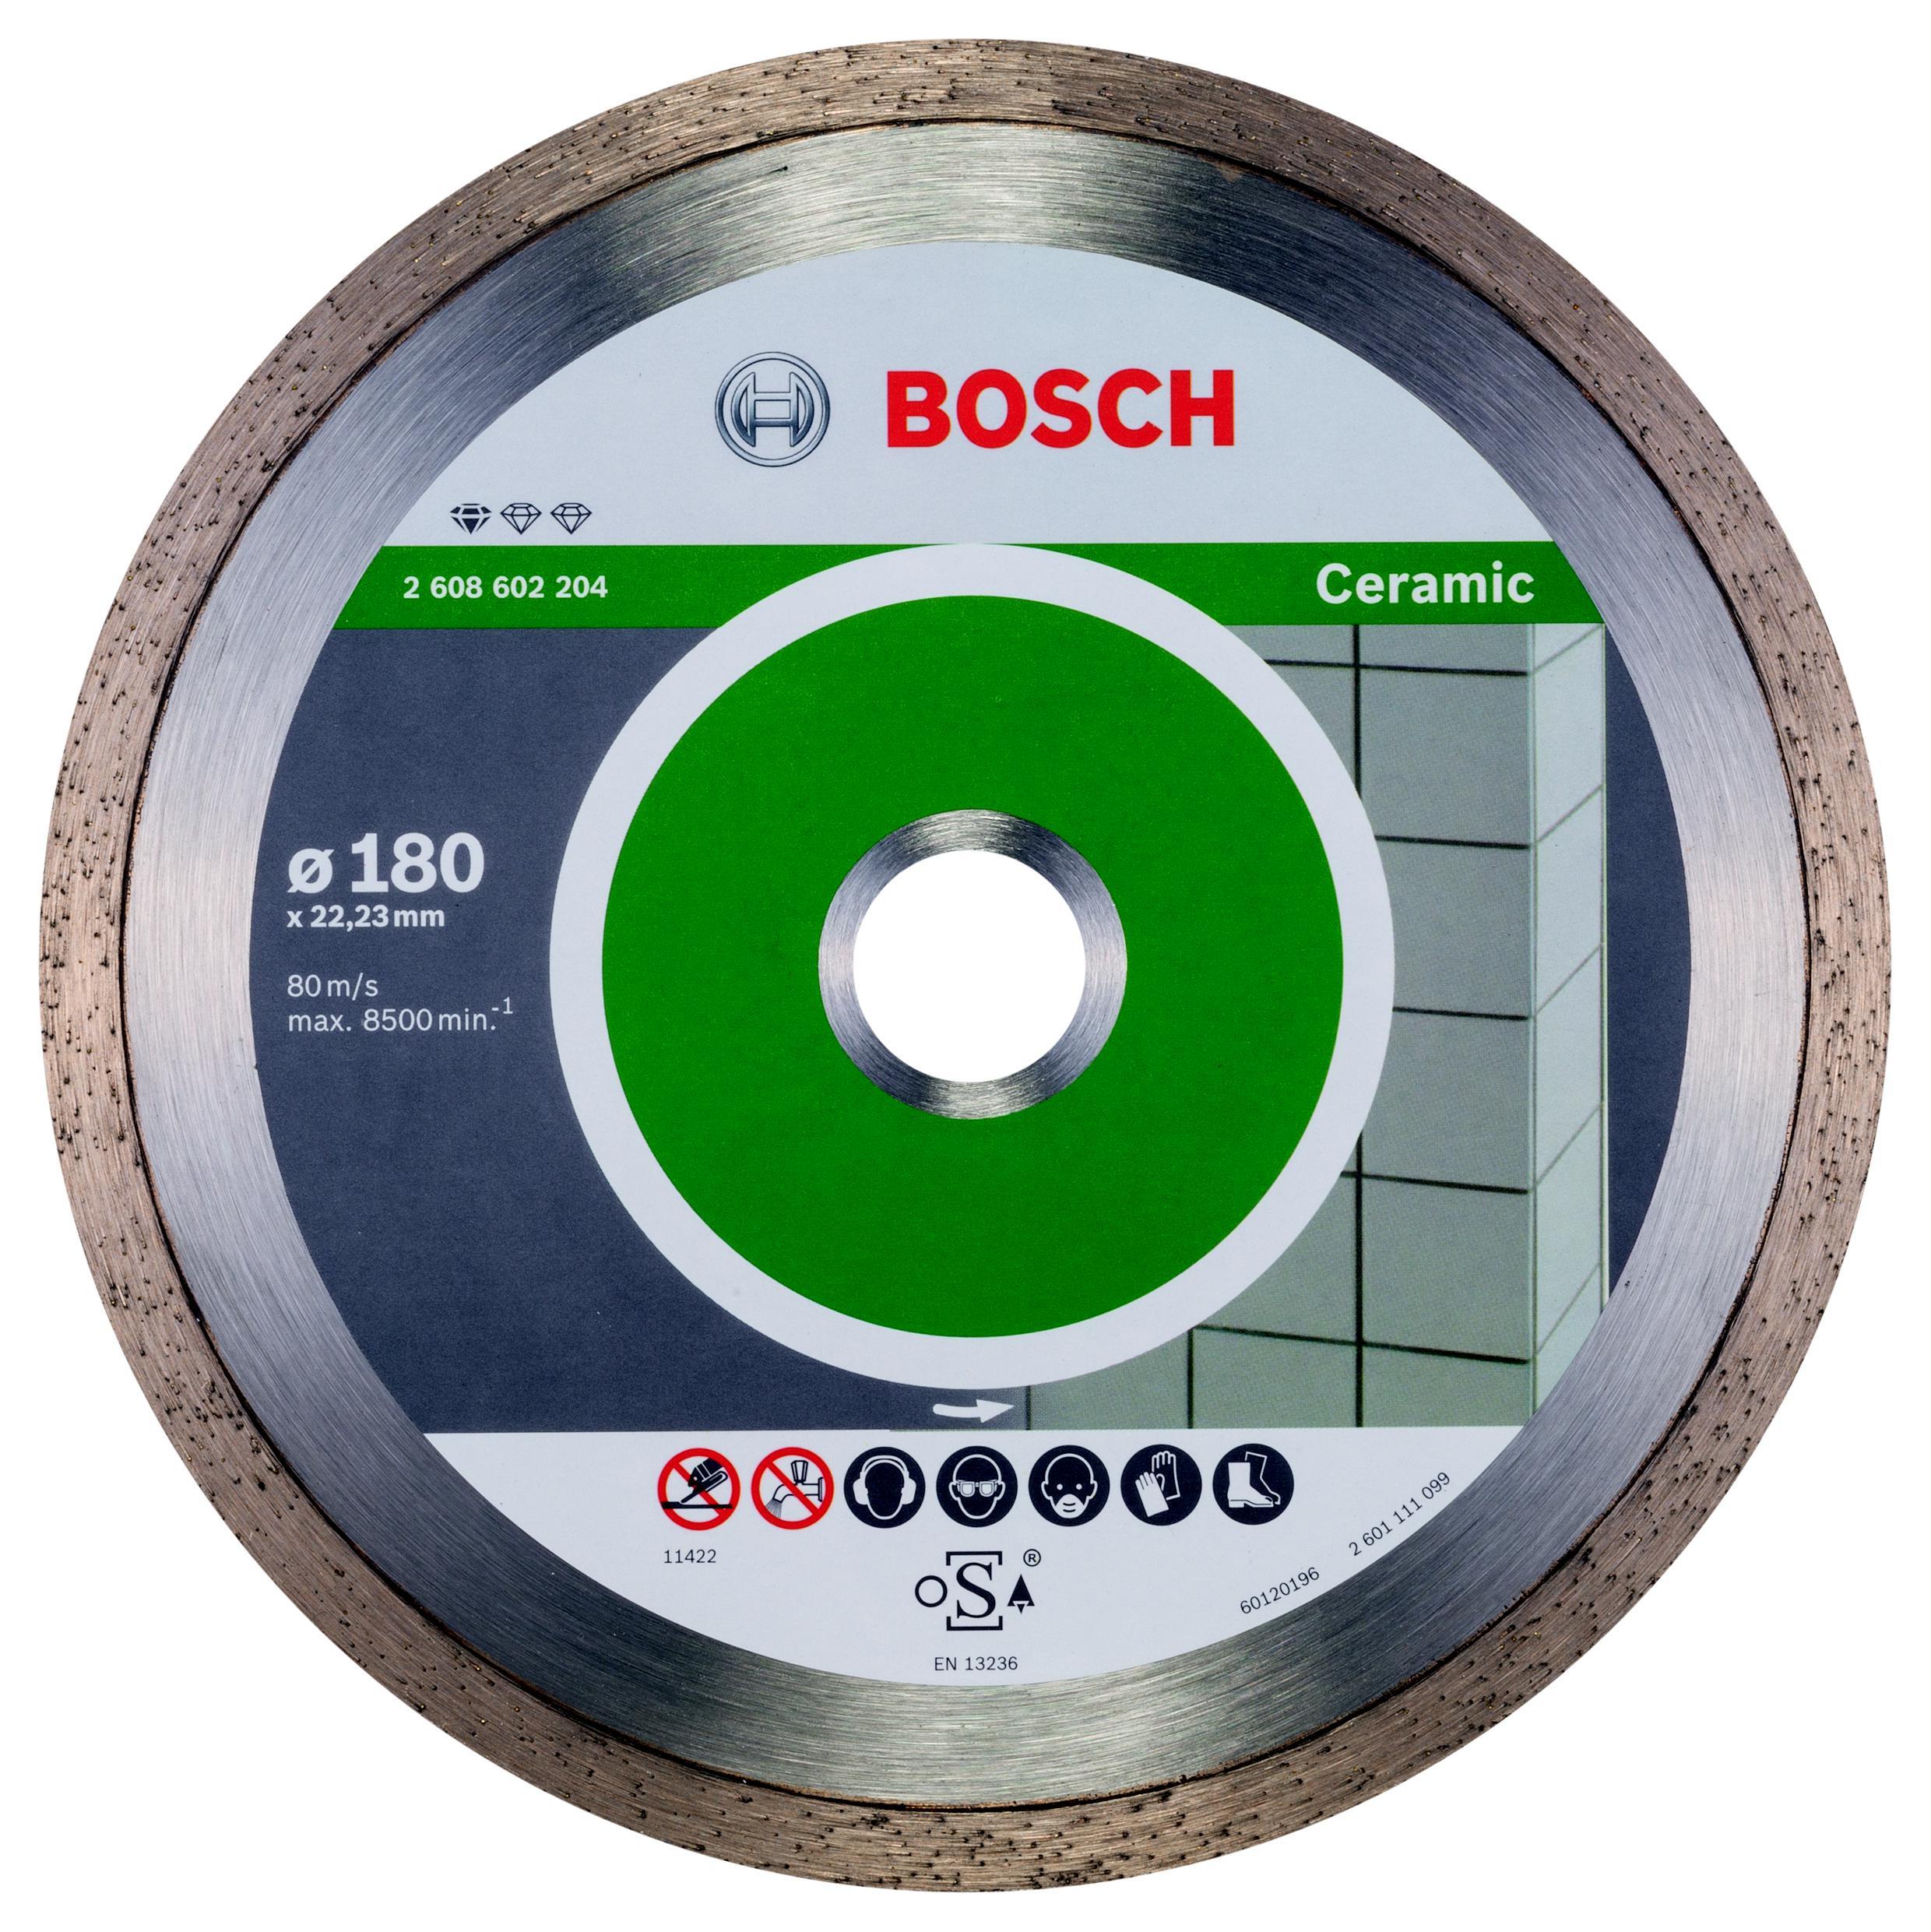 Круг алмазный Bosch Standard for ceramic 180x22 корона (сплошной)(2.608.602.204) алмазный диск bosch standard for ceramic 115 22 23 2608602201